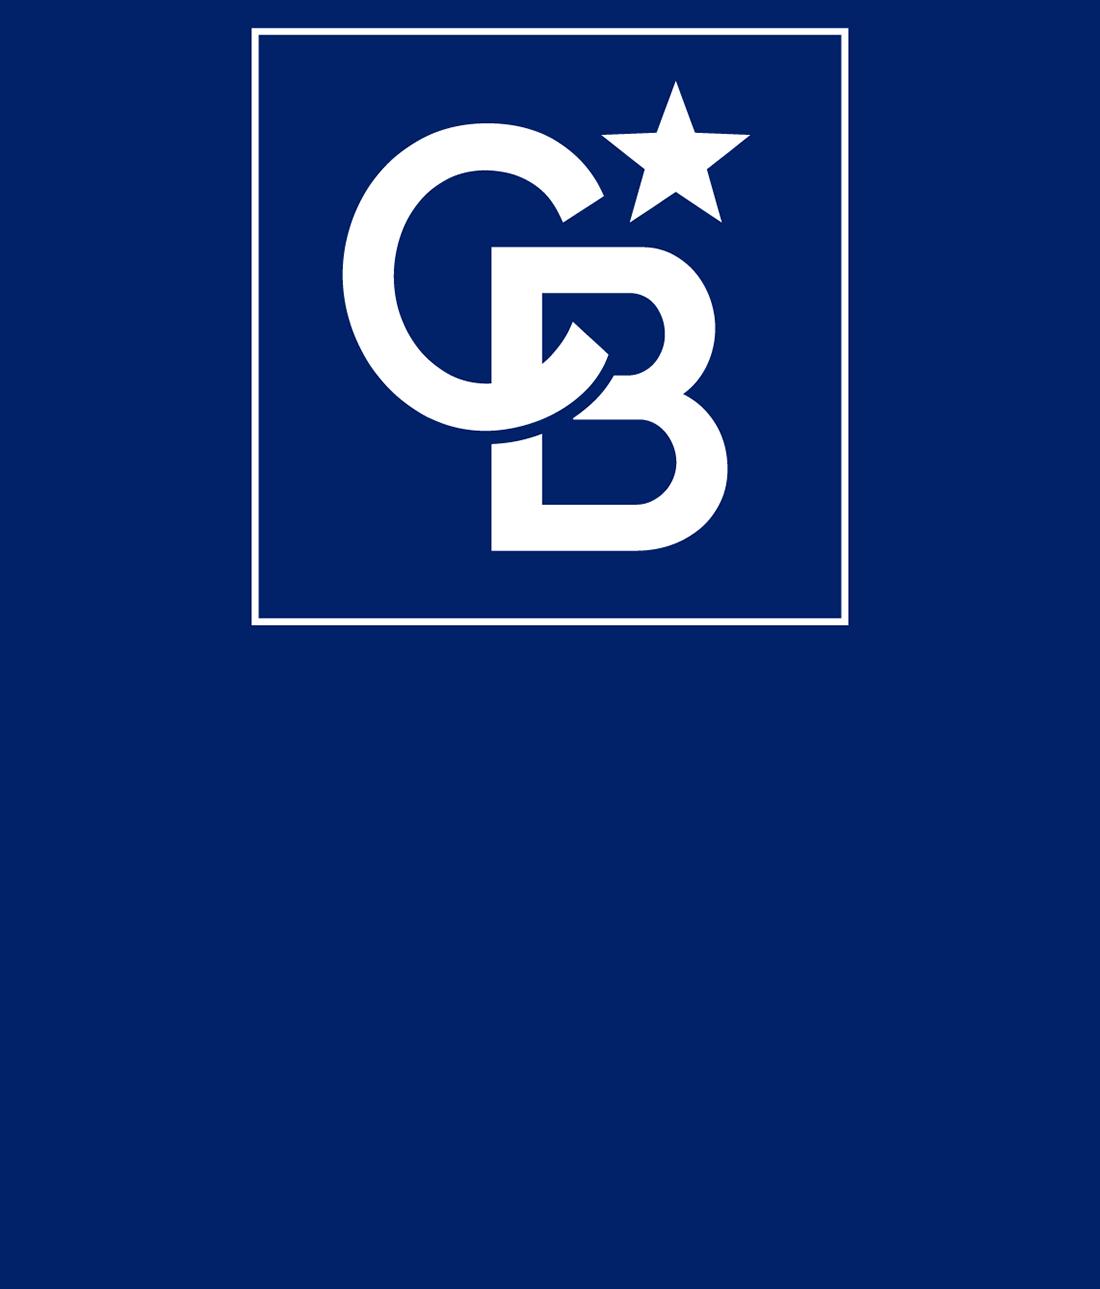 cbhs05 Logo